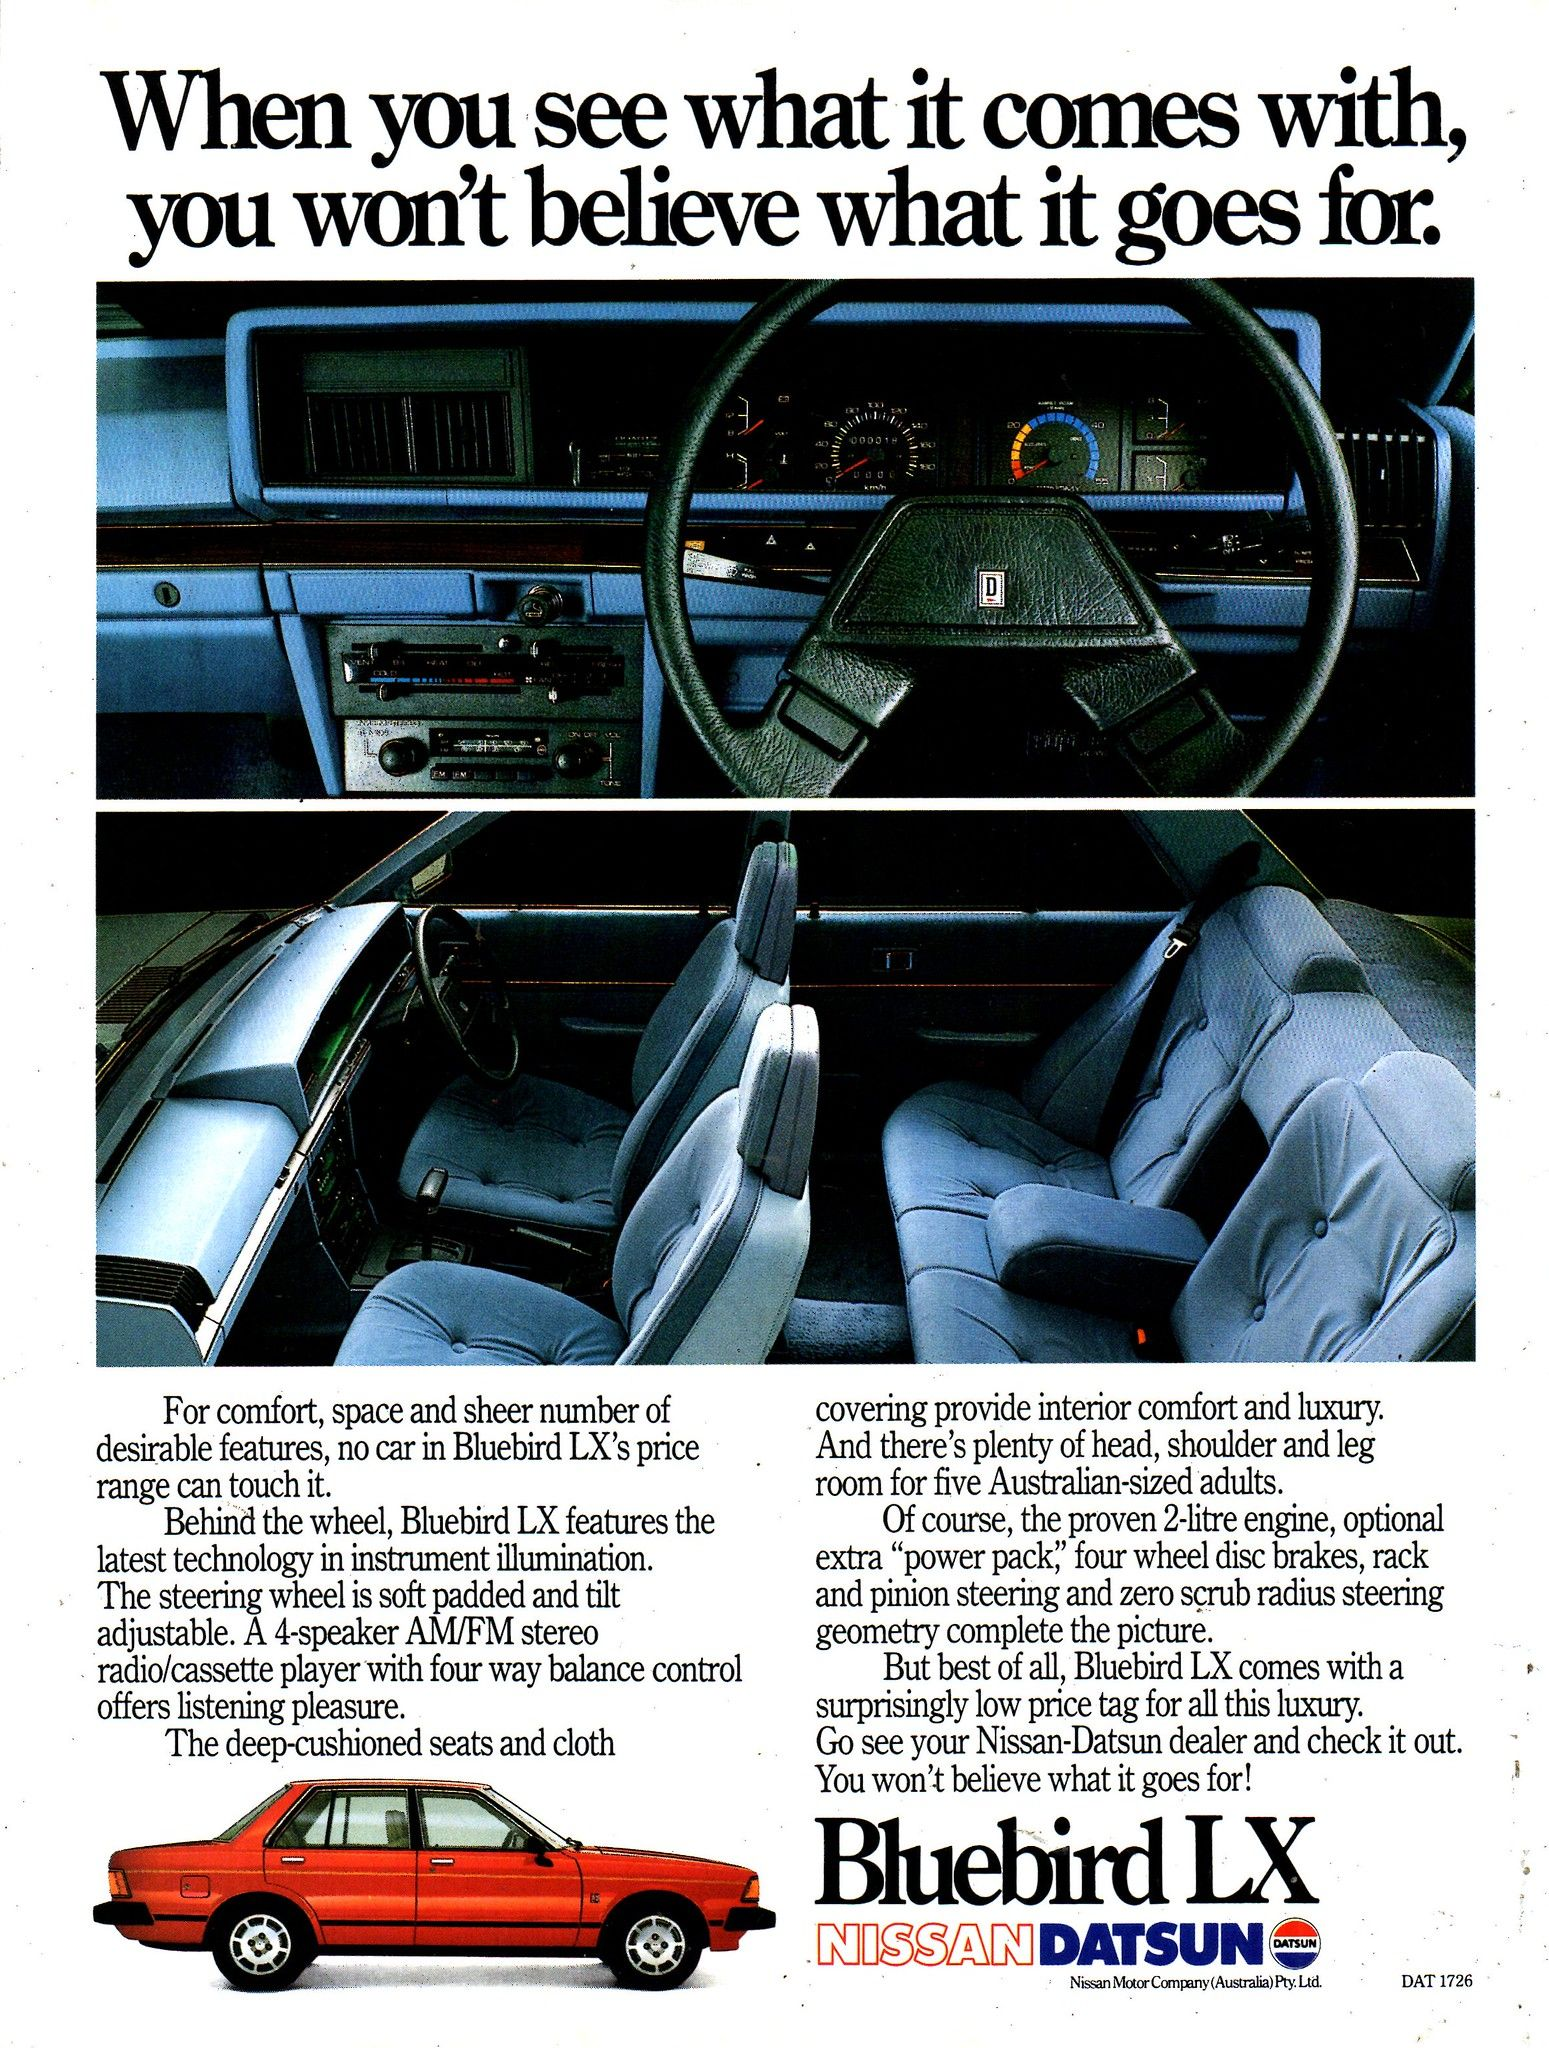 1983 Nissan Datsun Bluebird Lx Sedan Aussie Original Magazine Advertisement Datsun Datsun Bluebird Nissan